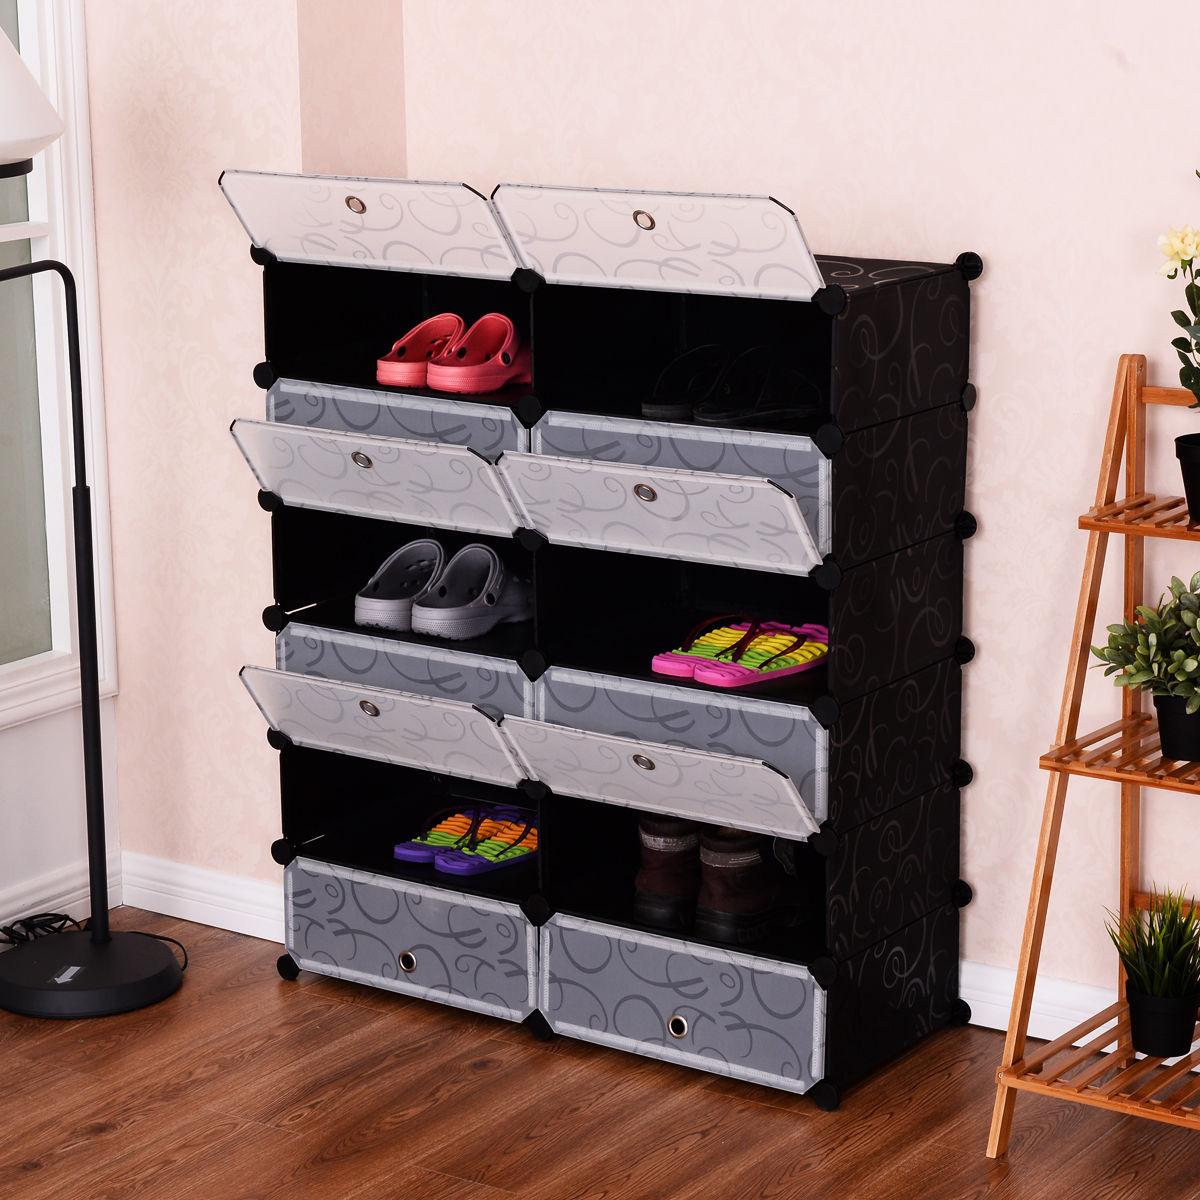 Costway 12 Cubic Portable Shoe Rack Shelf Cabinet Storage Closet Organizer  Home Furni Part 72